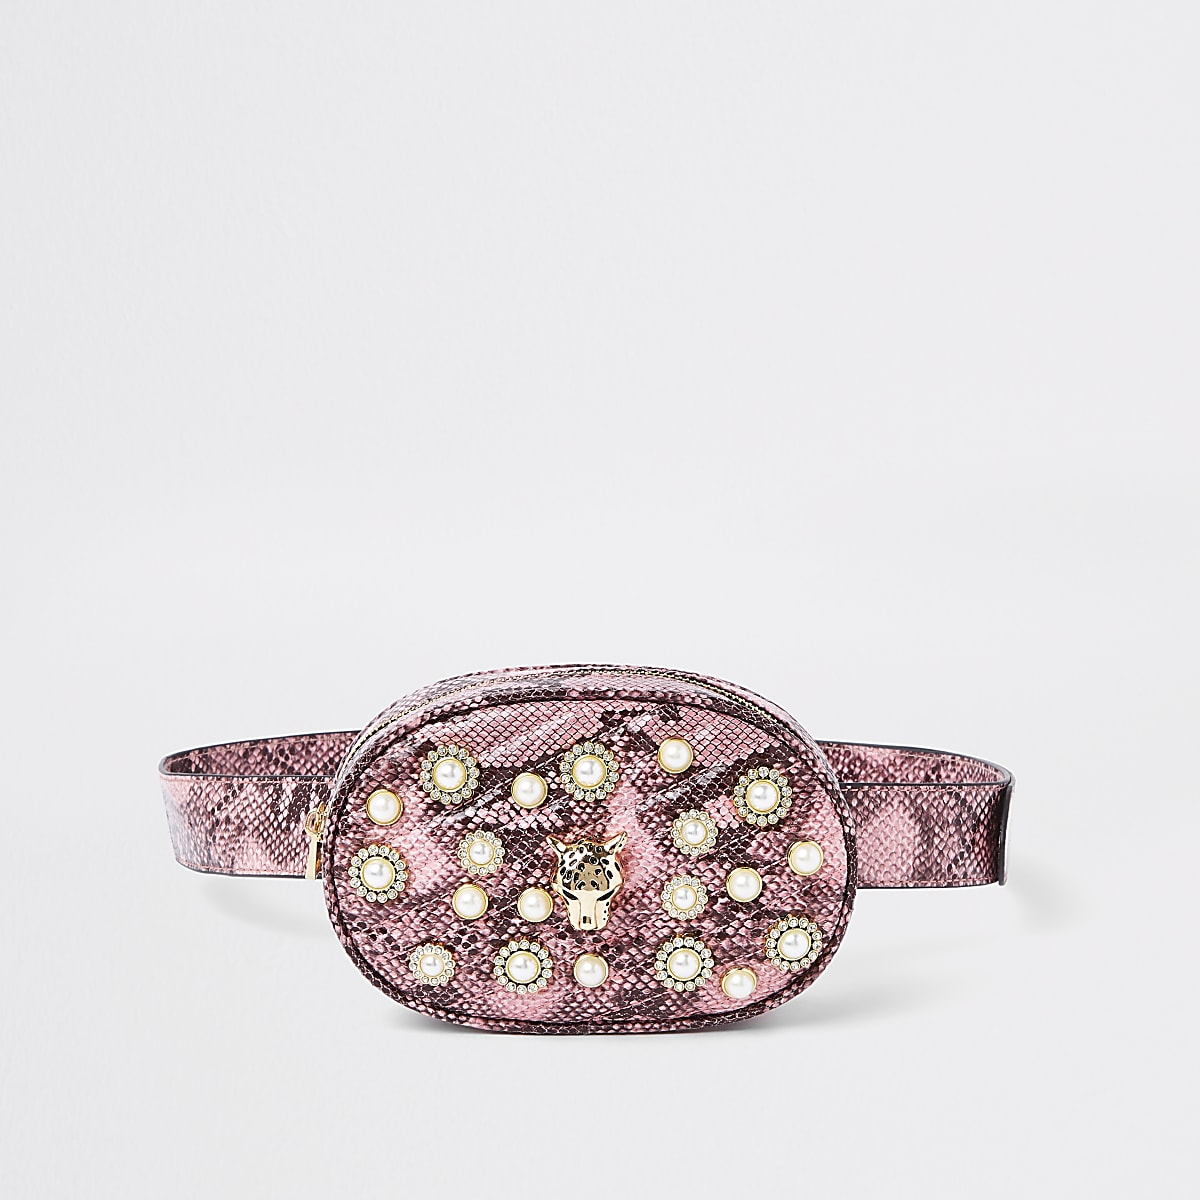 c6a16909192 Roze heuptasje met verfraaide riem en slangenprint Roze heuptasje met  verfraaide riem en slangenprint ...